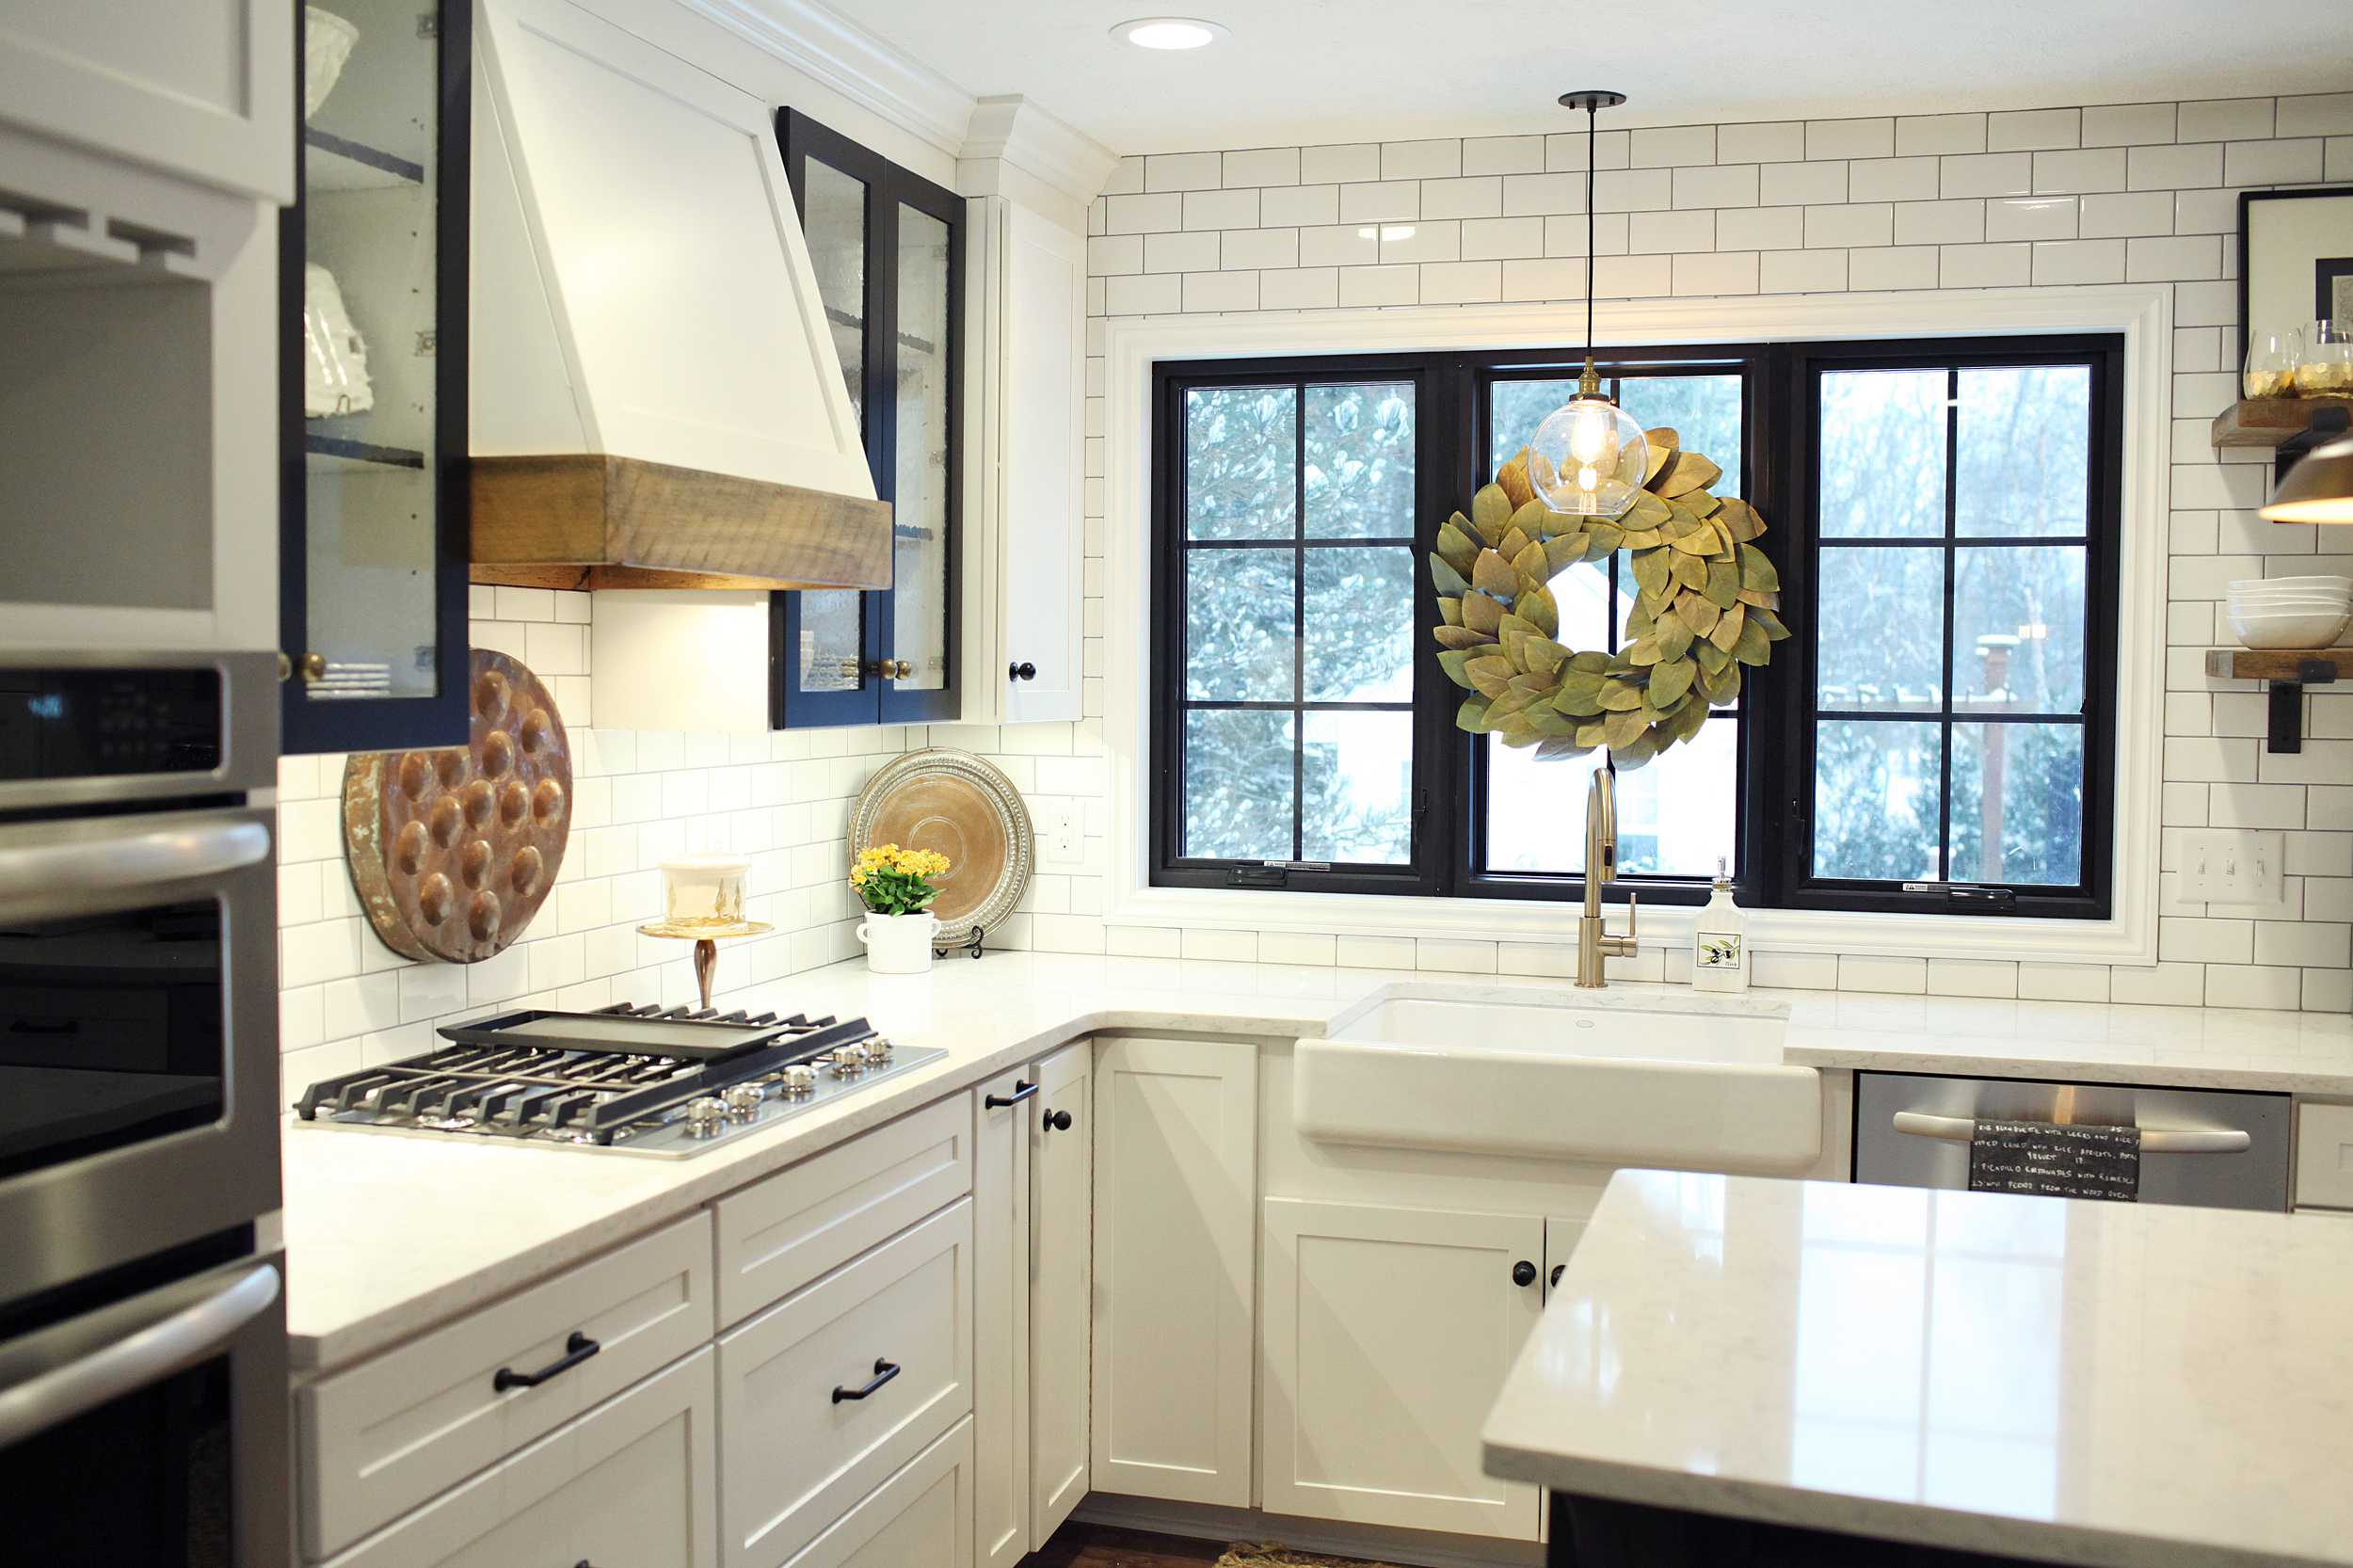 kitchen_remodel (9).jpg